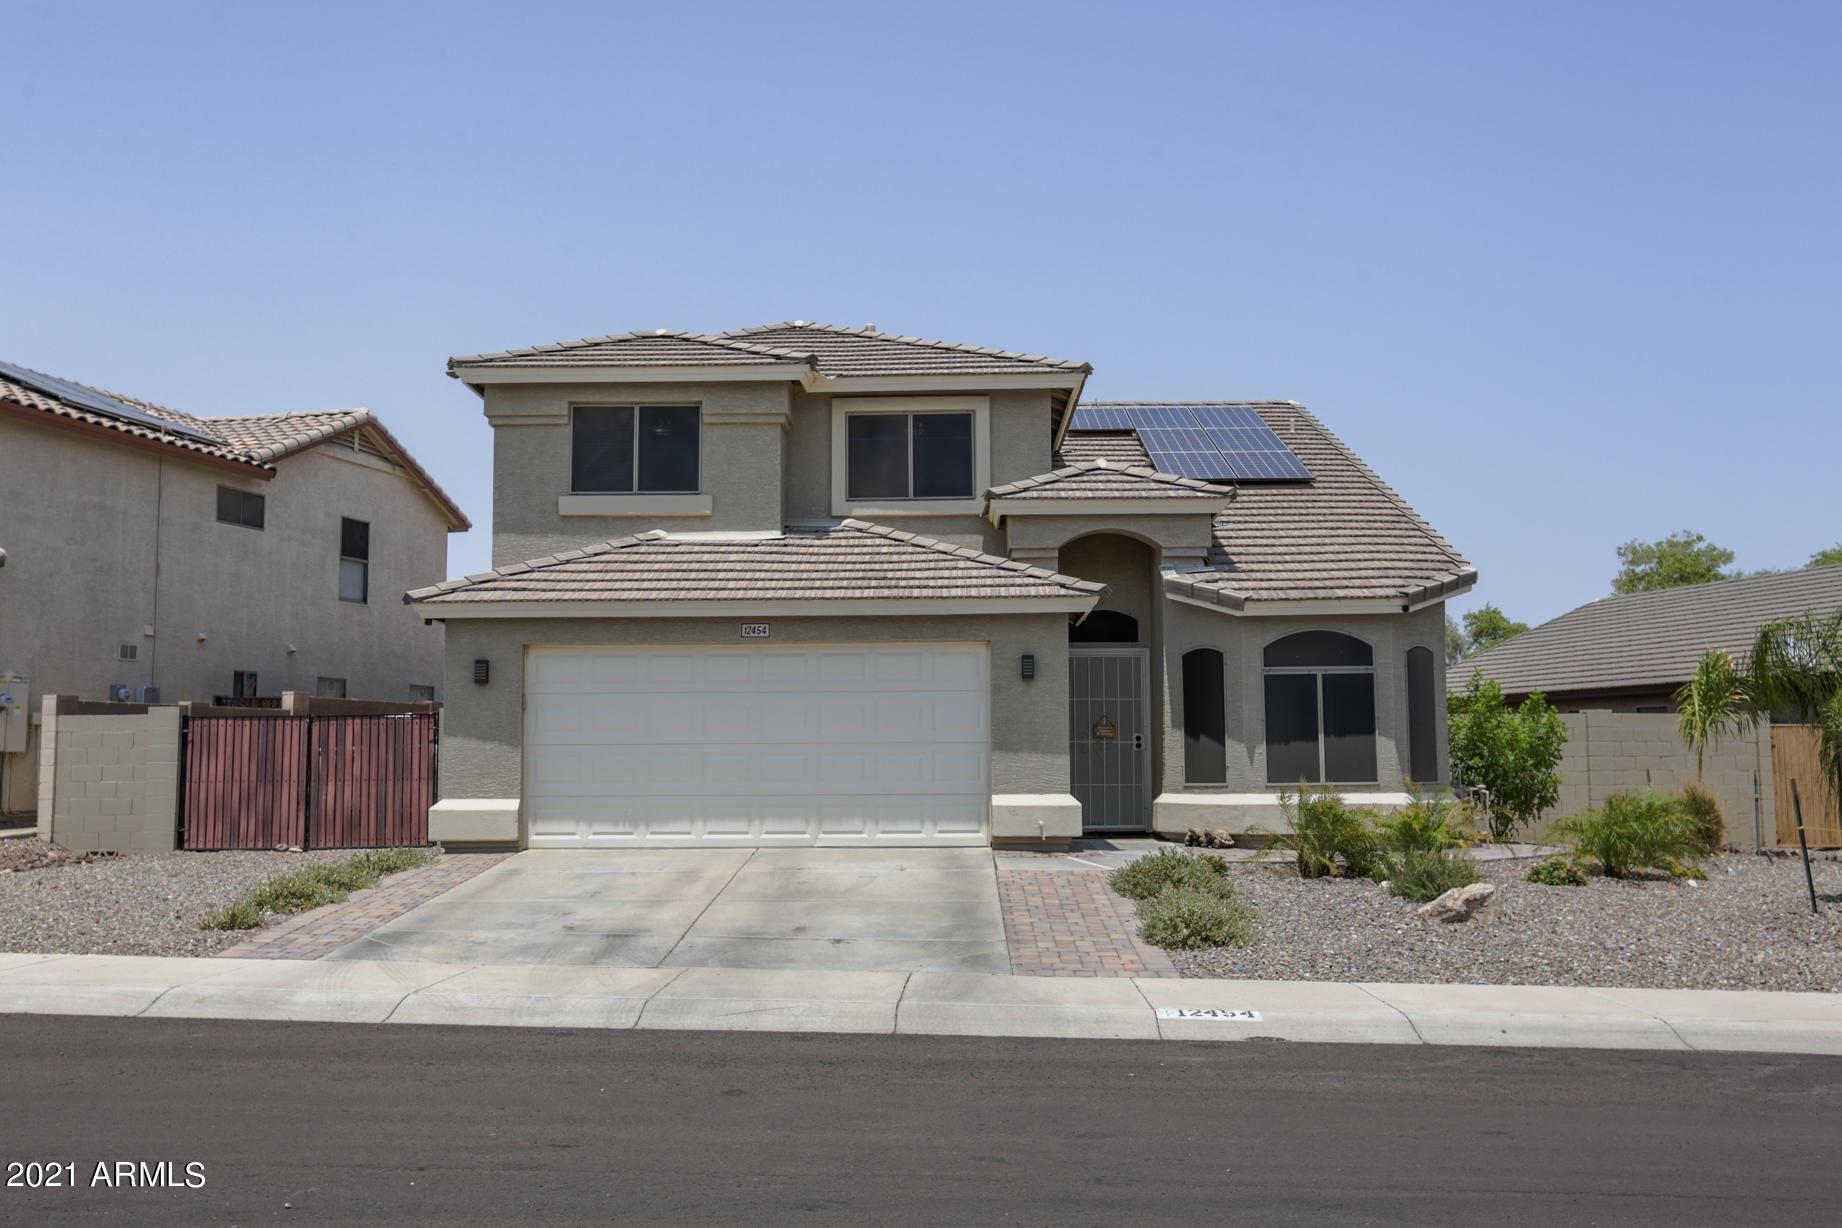 Photo of 12454 W SOLANO Drive, Litchfield Park, AZ 85340 (MLS # 6265117)